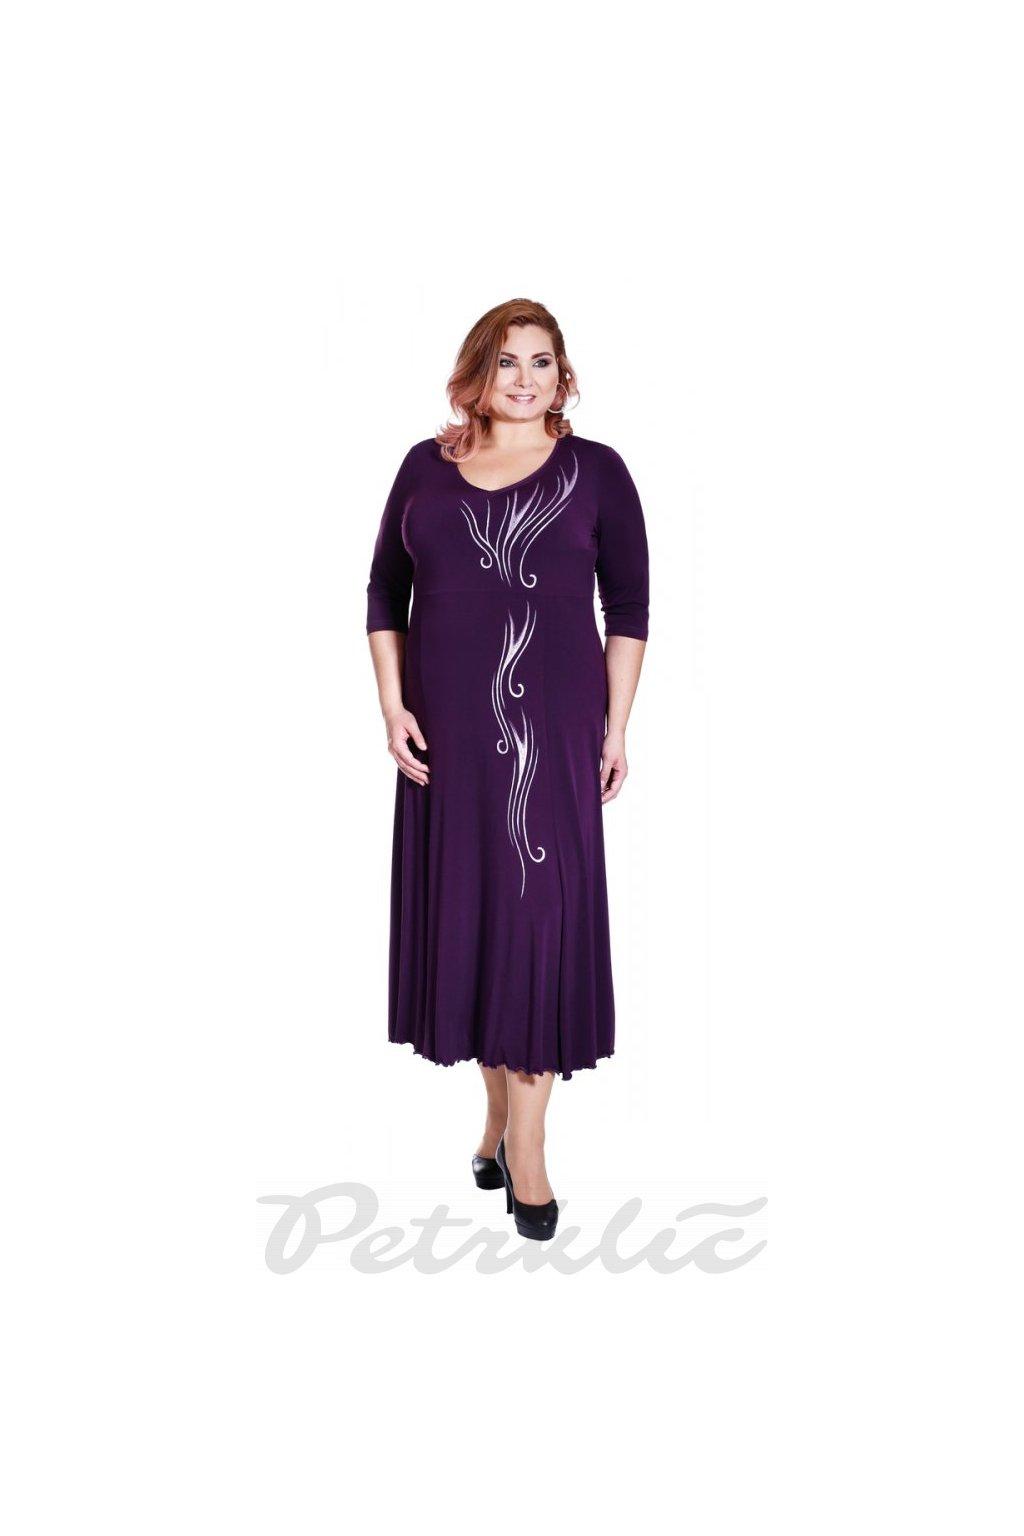 MÁJA - šaty s 3/4 rukávem 120 - 125 cm